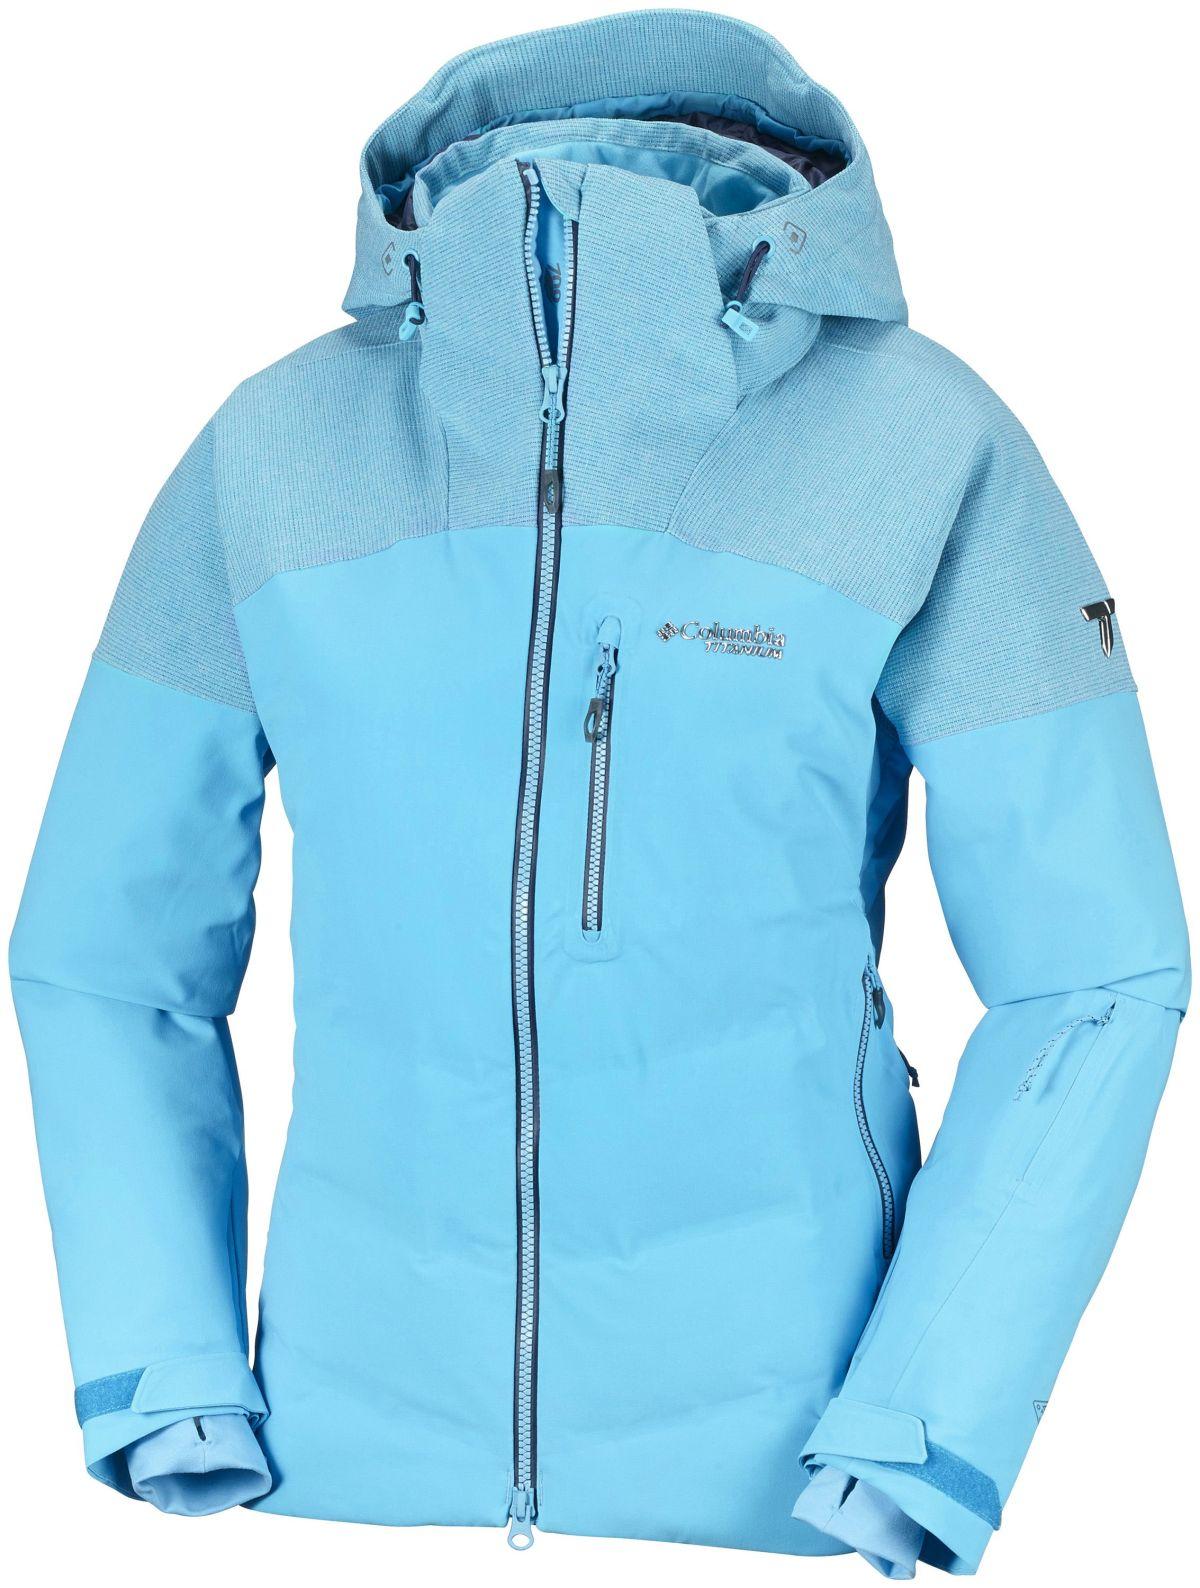 Columbia Sportswear Titanium Powder Keg II Down Jacket